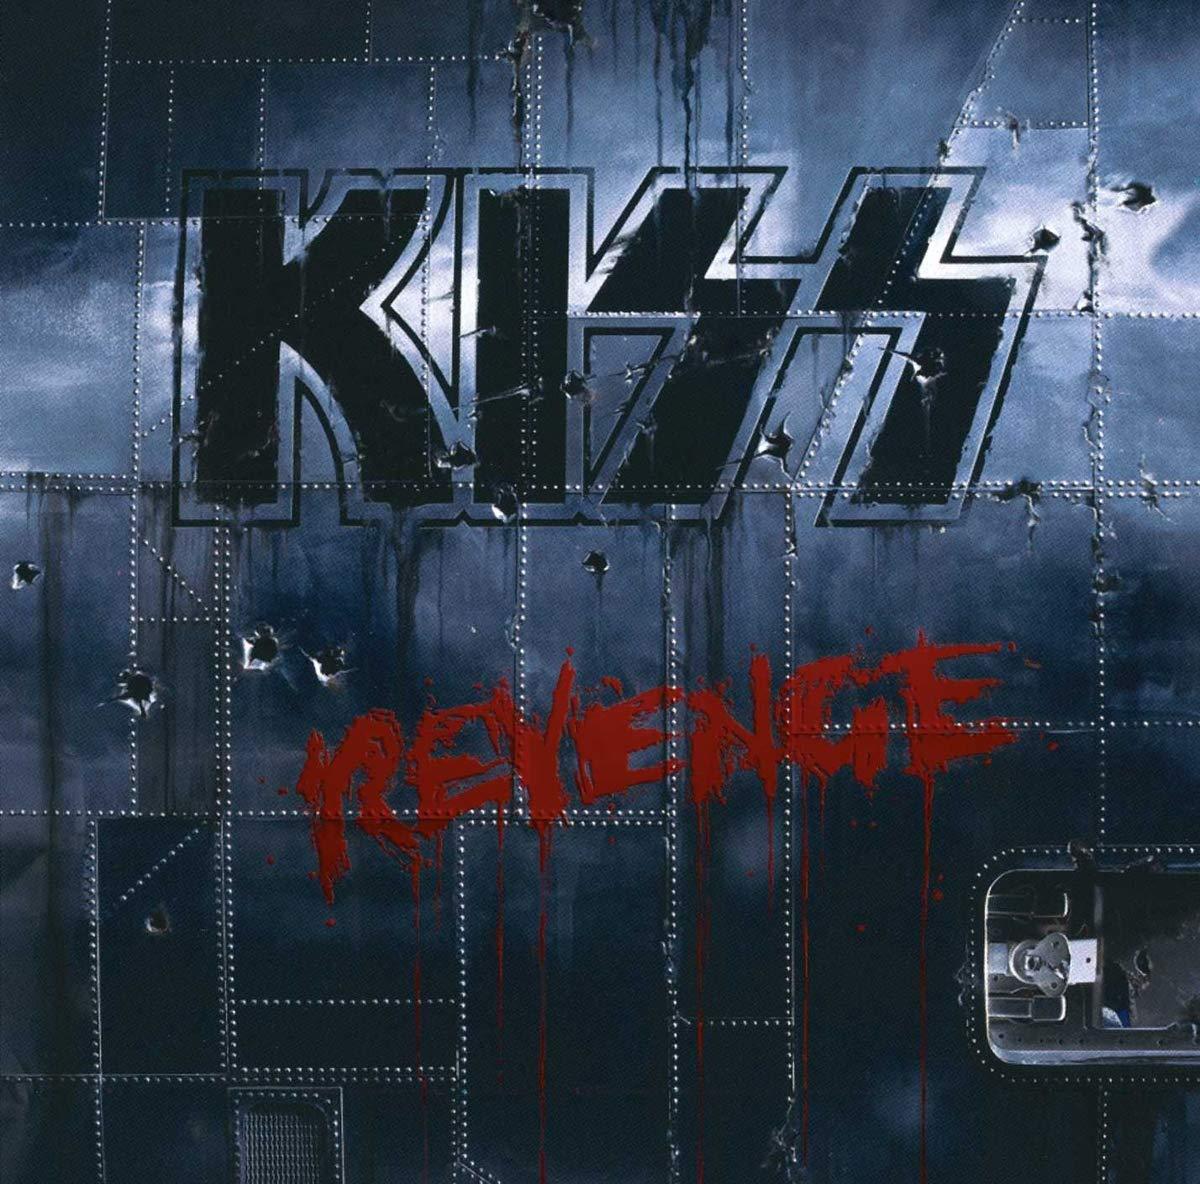 KISS - Revenge - Amazon.com Music